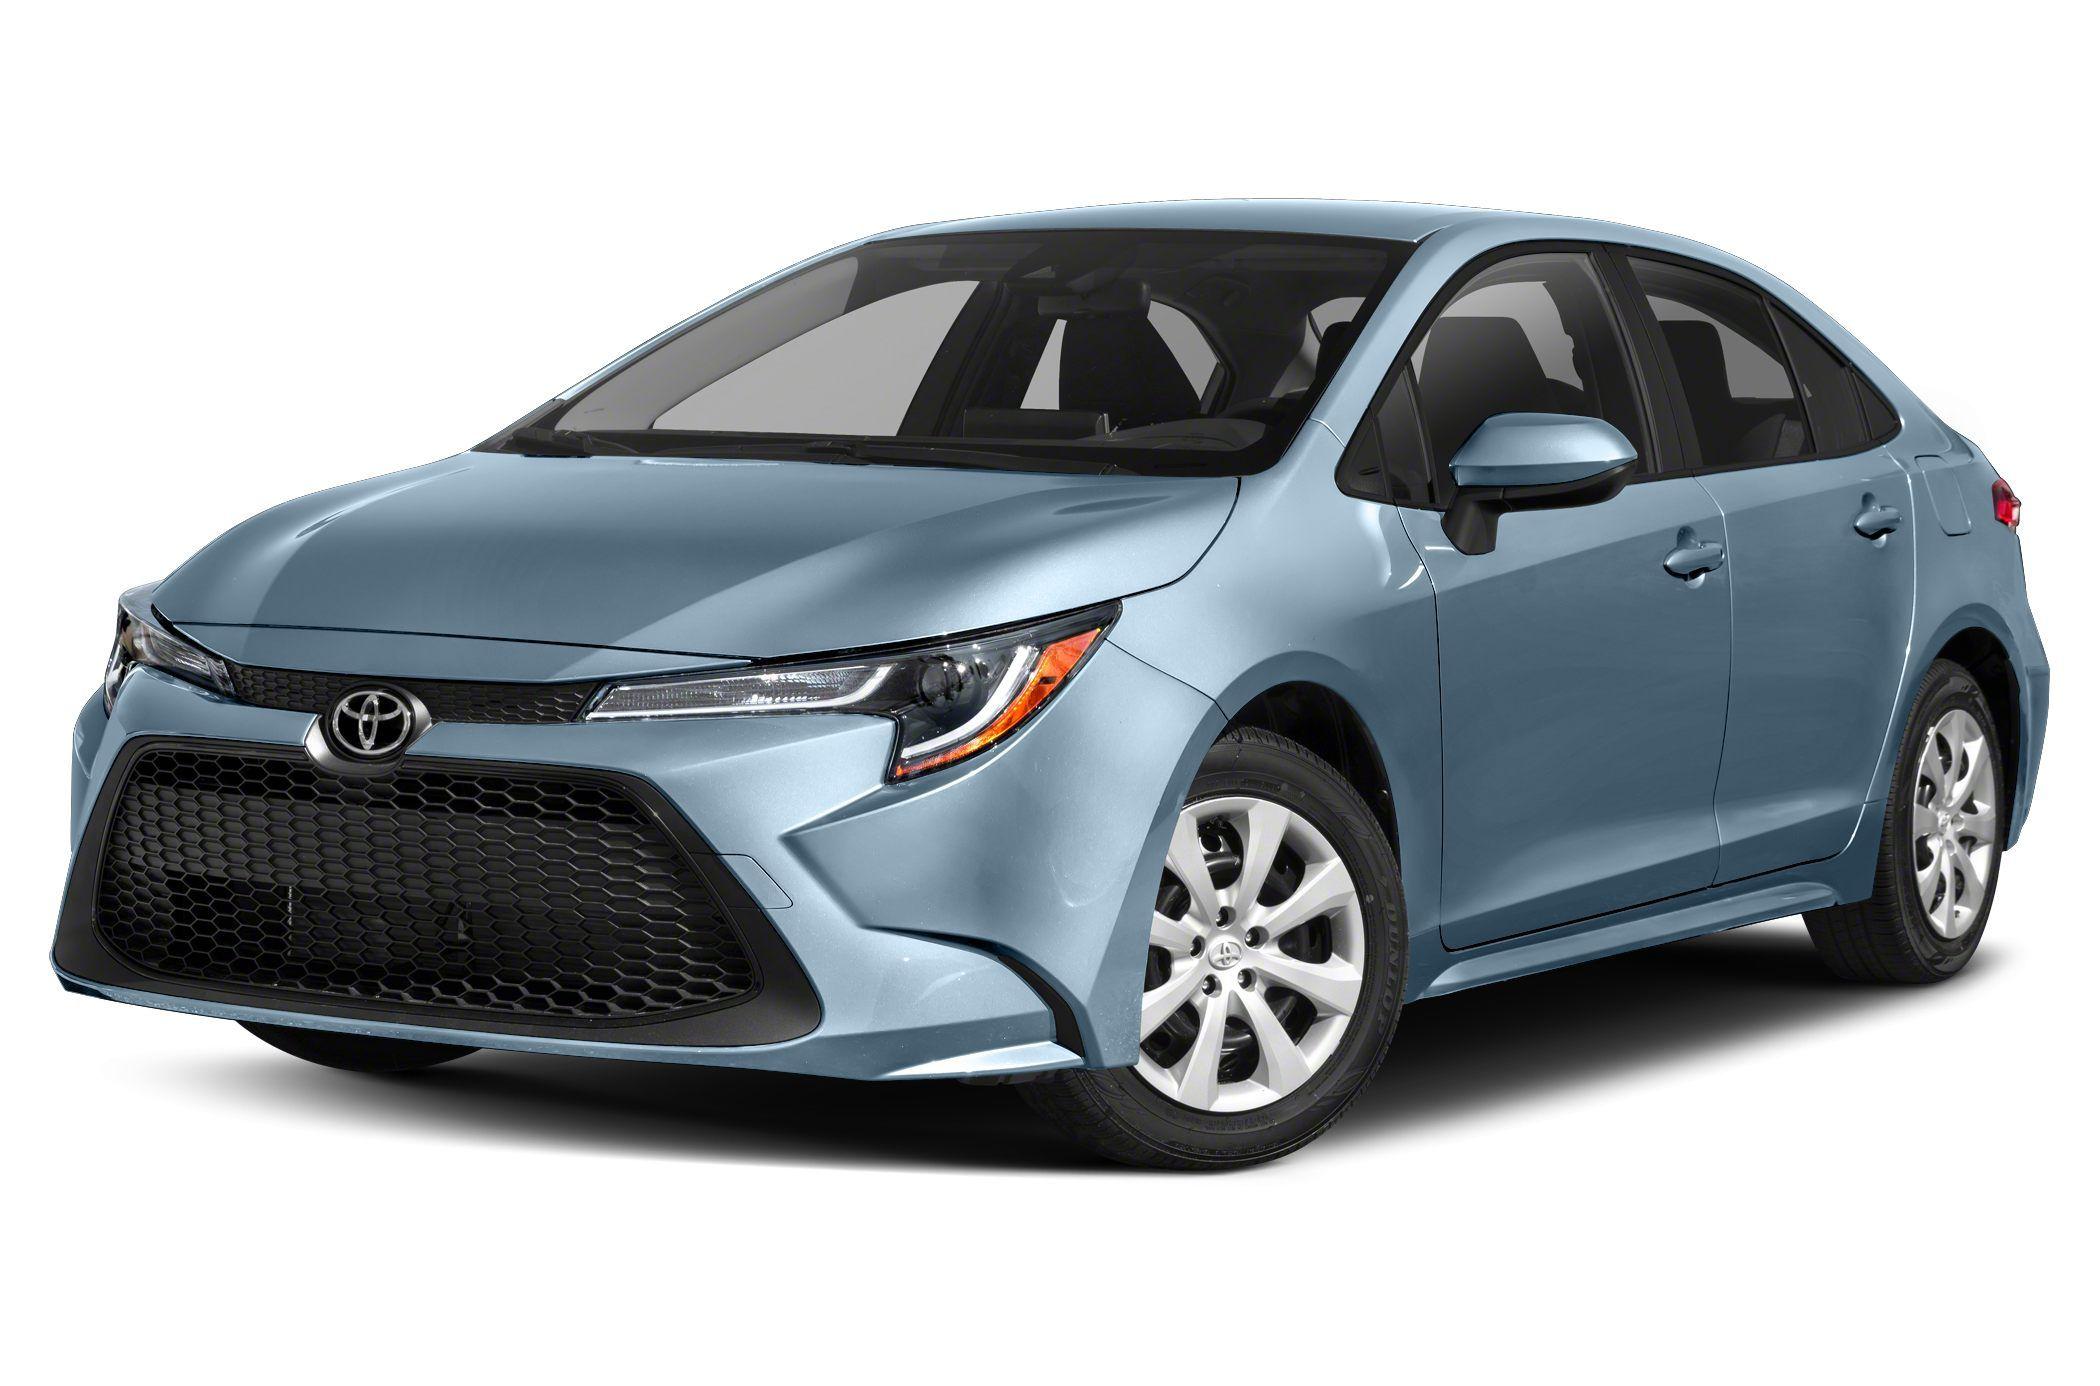 2020 Toyota Corolla Hatchback Toyota Corolla Le Toyota Corolla Toyota Cars